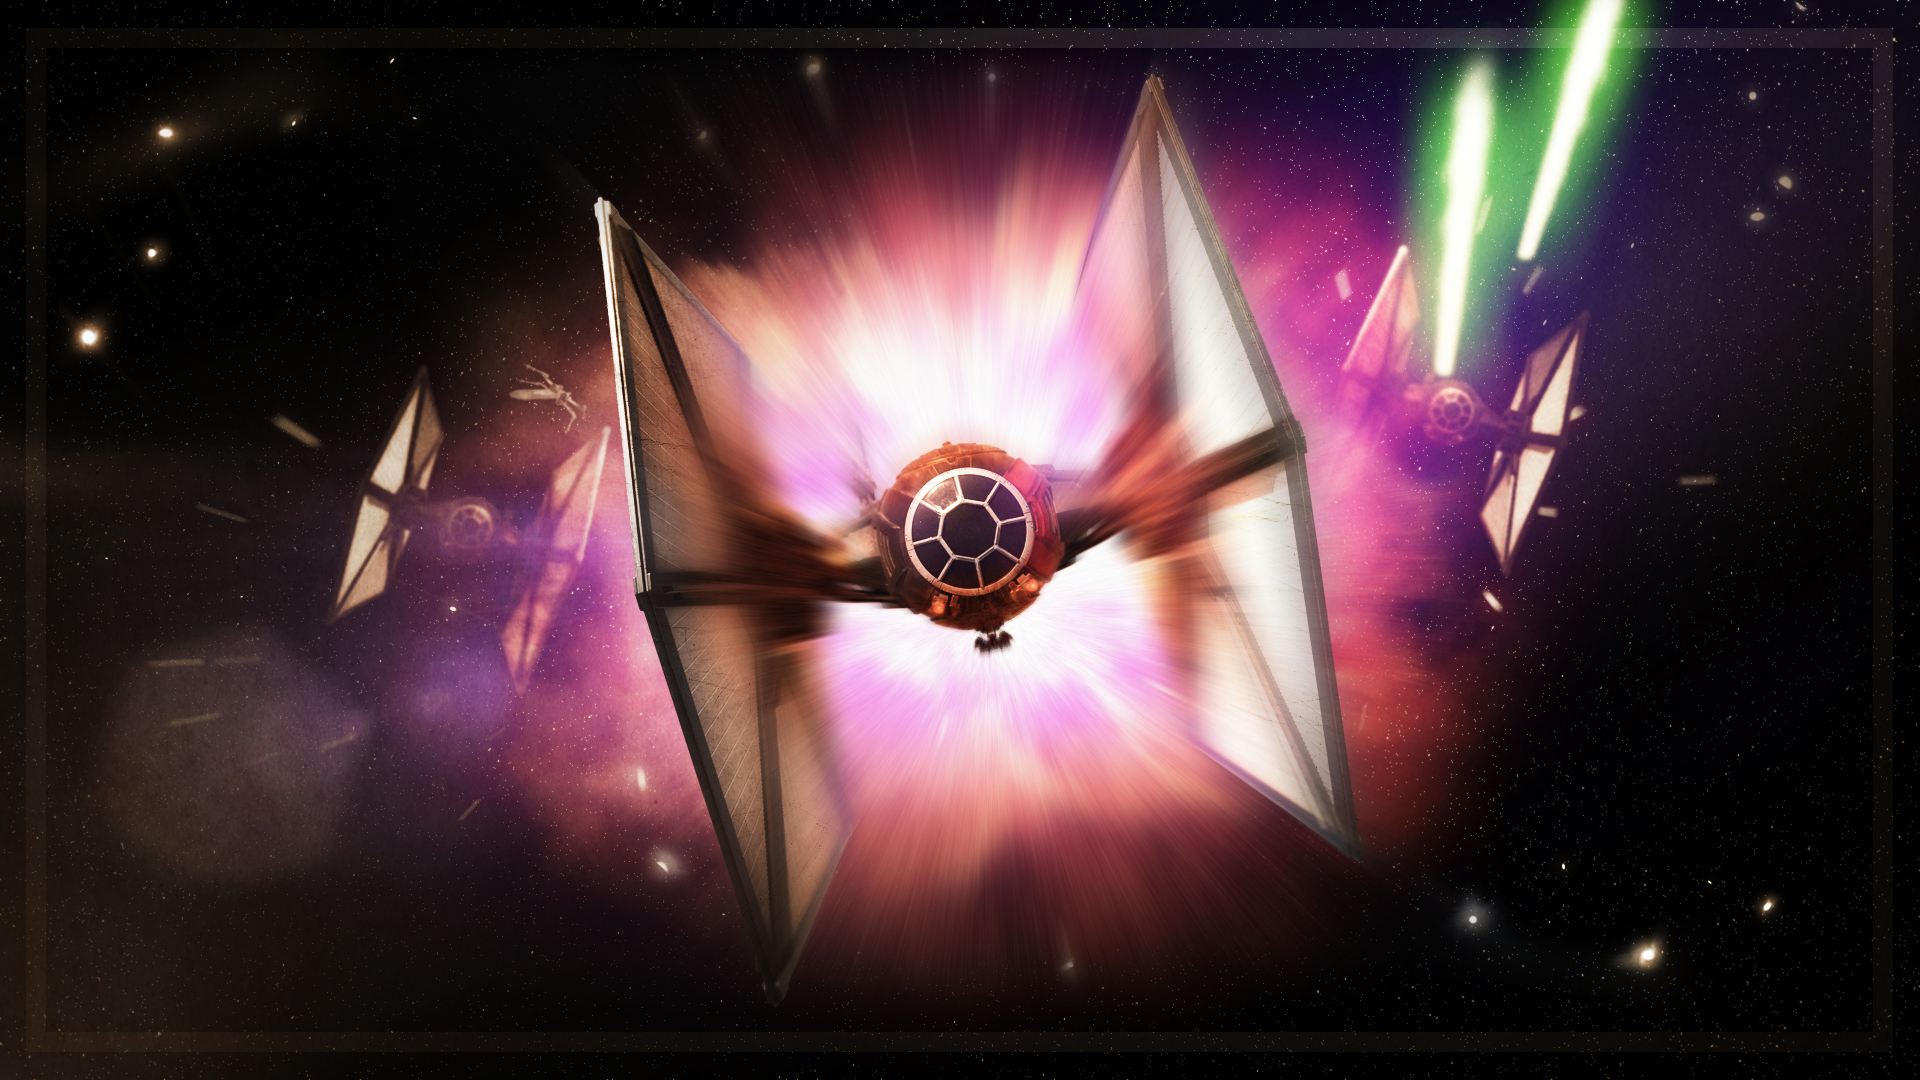 Star Wars Tie Fighter Wallpapers Wallpaper Cave